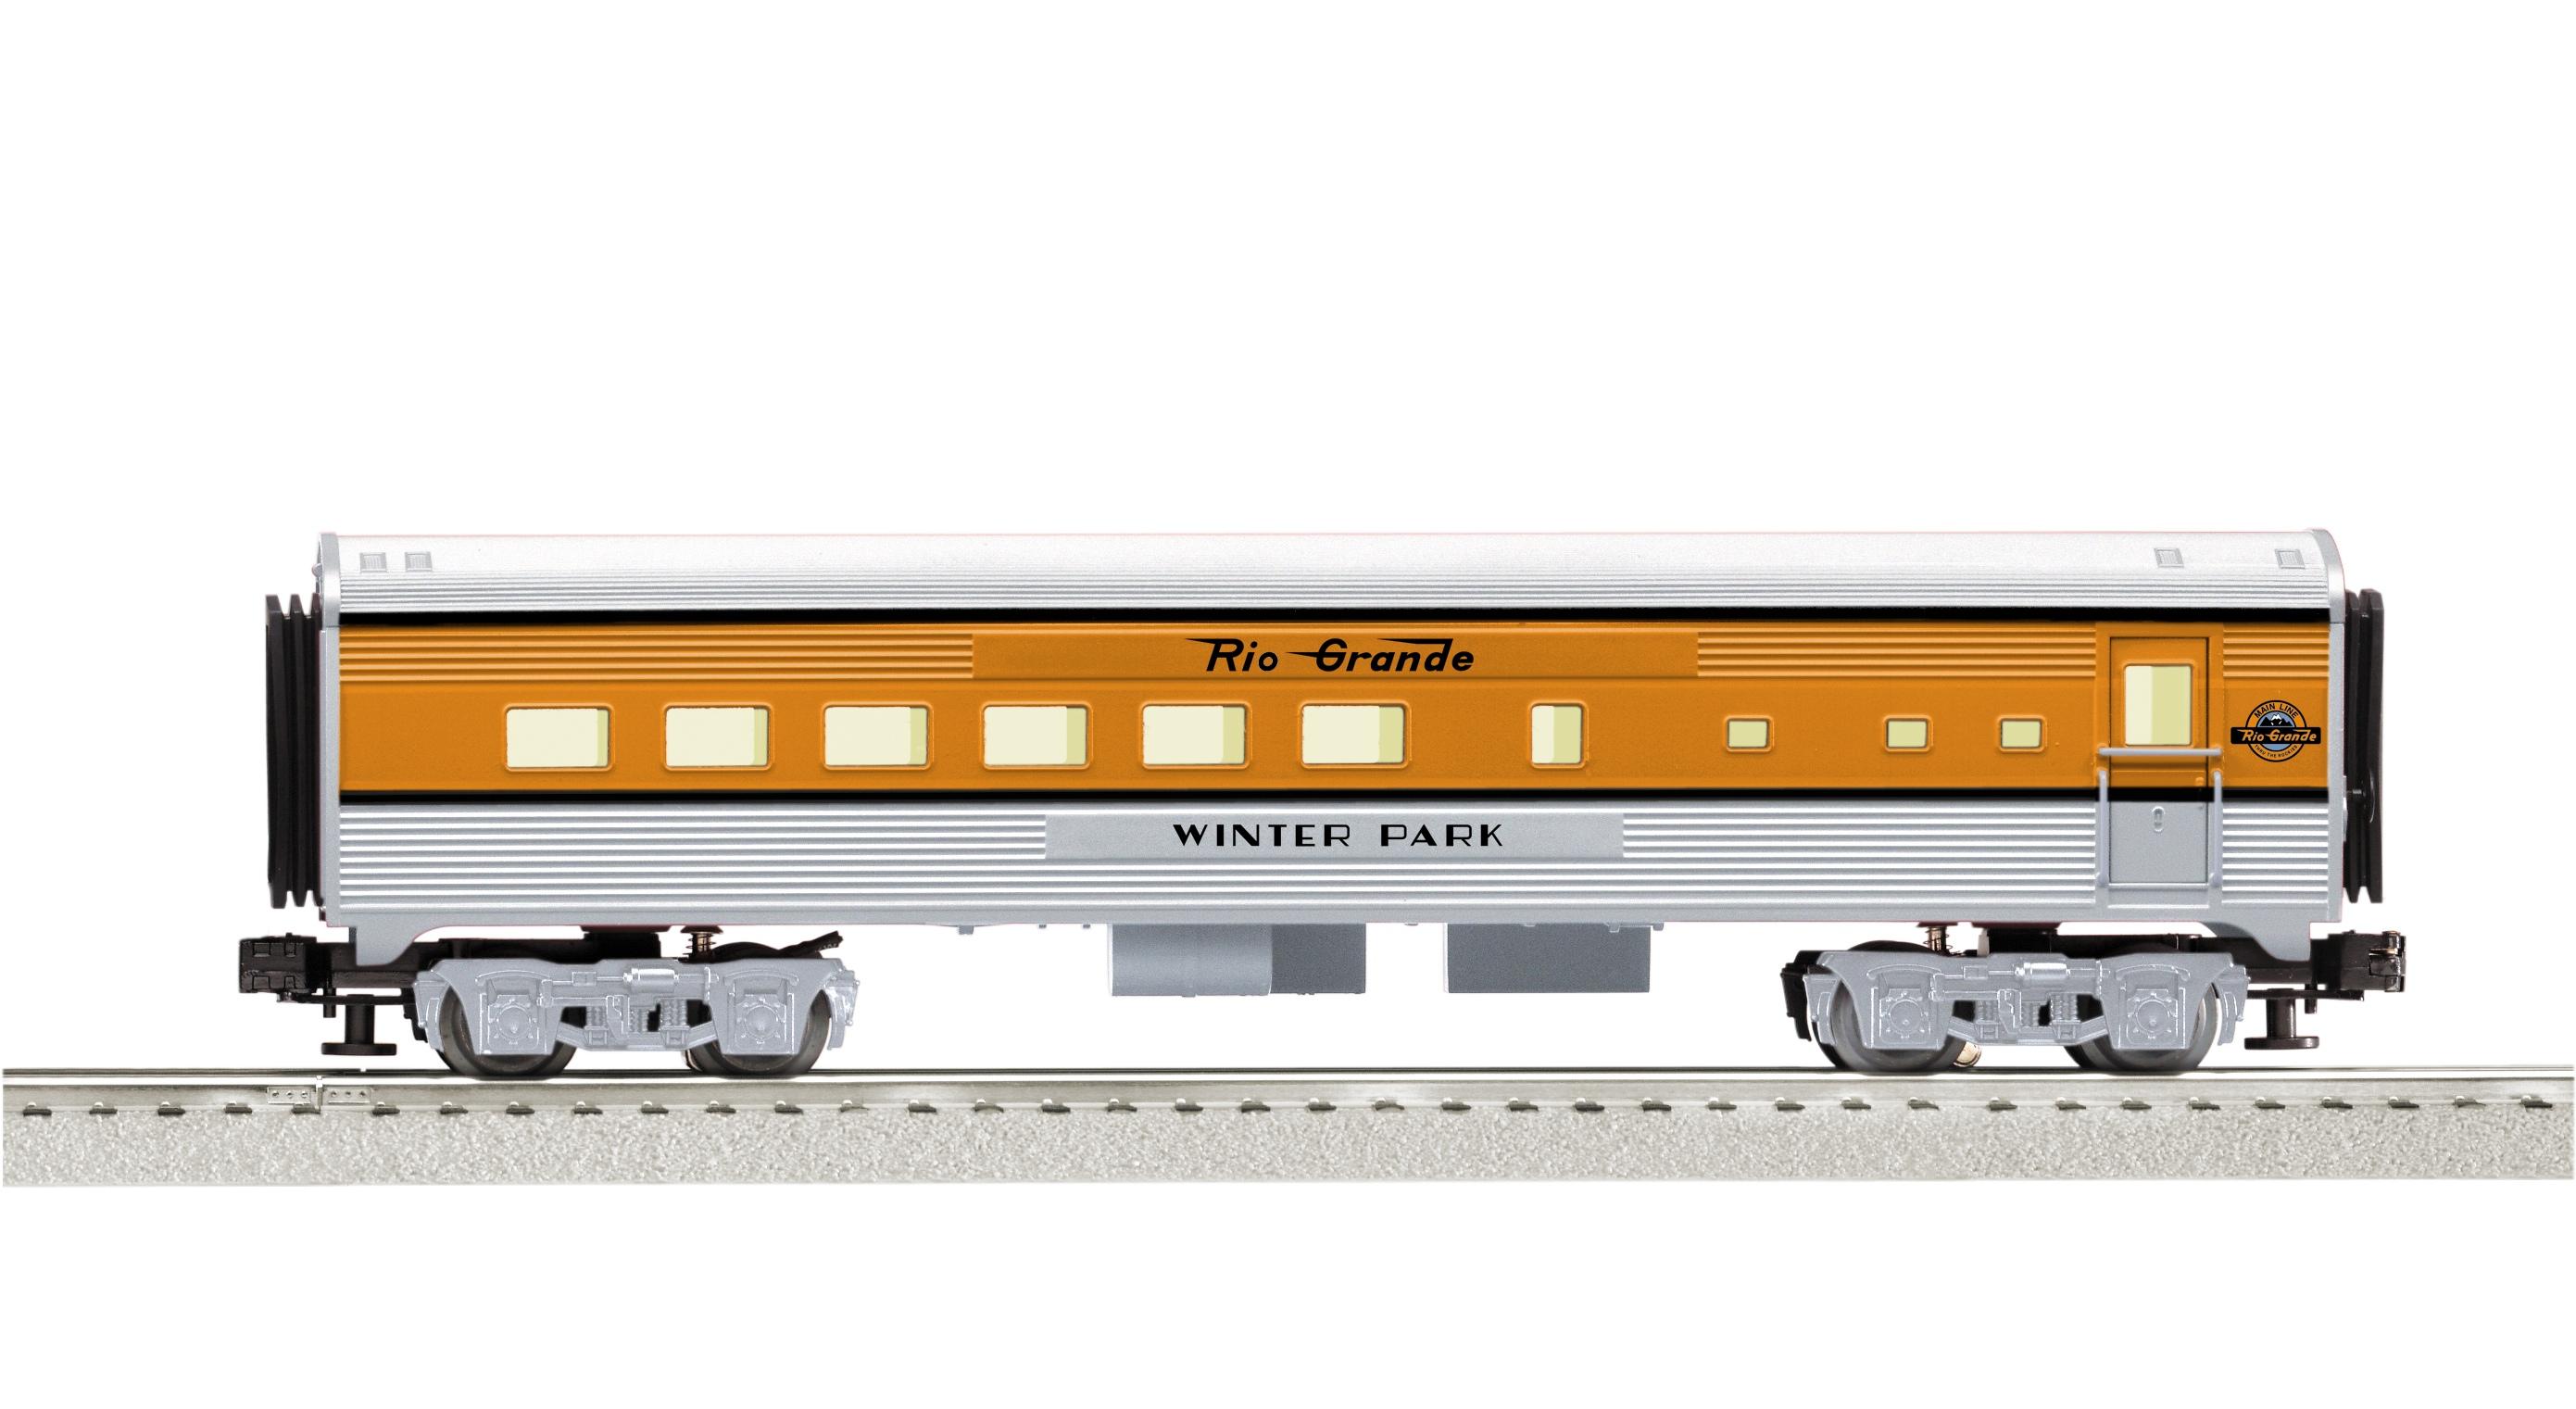 Union Park Dining Room Rio Grande Quot Ski Train Quot Streamliner Diner Quot Winter Park Quot